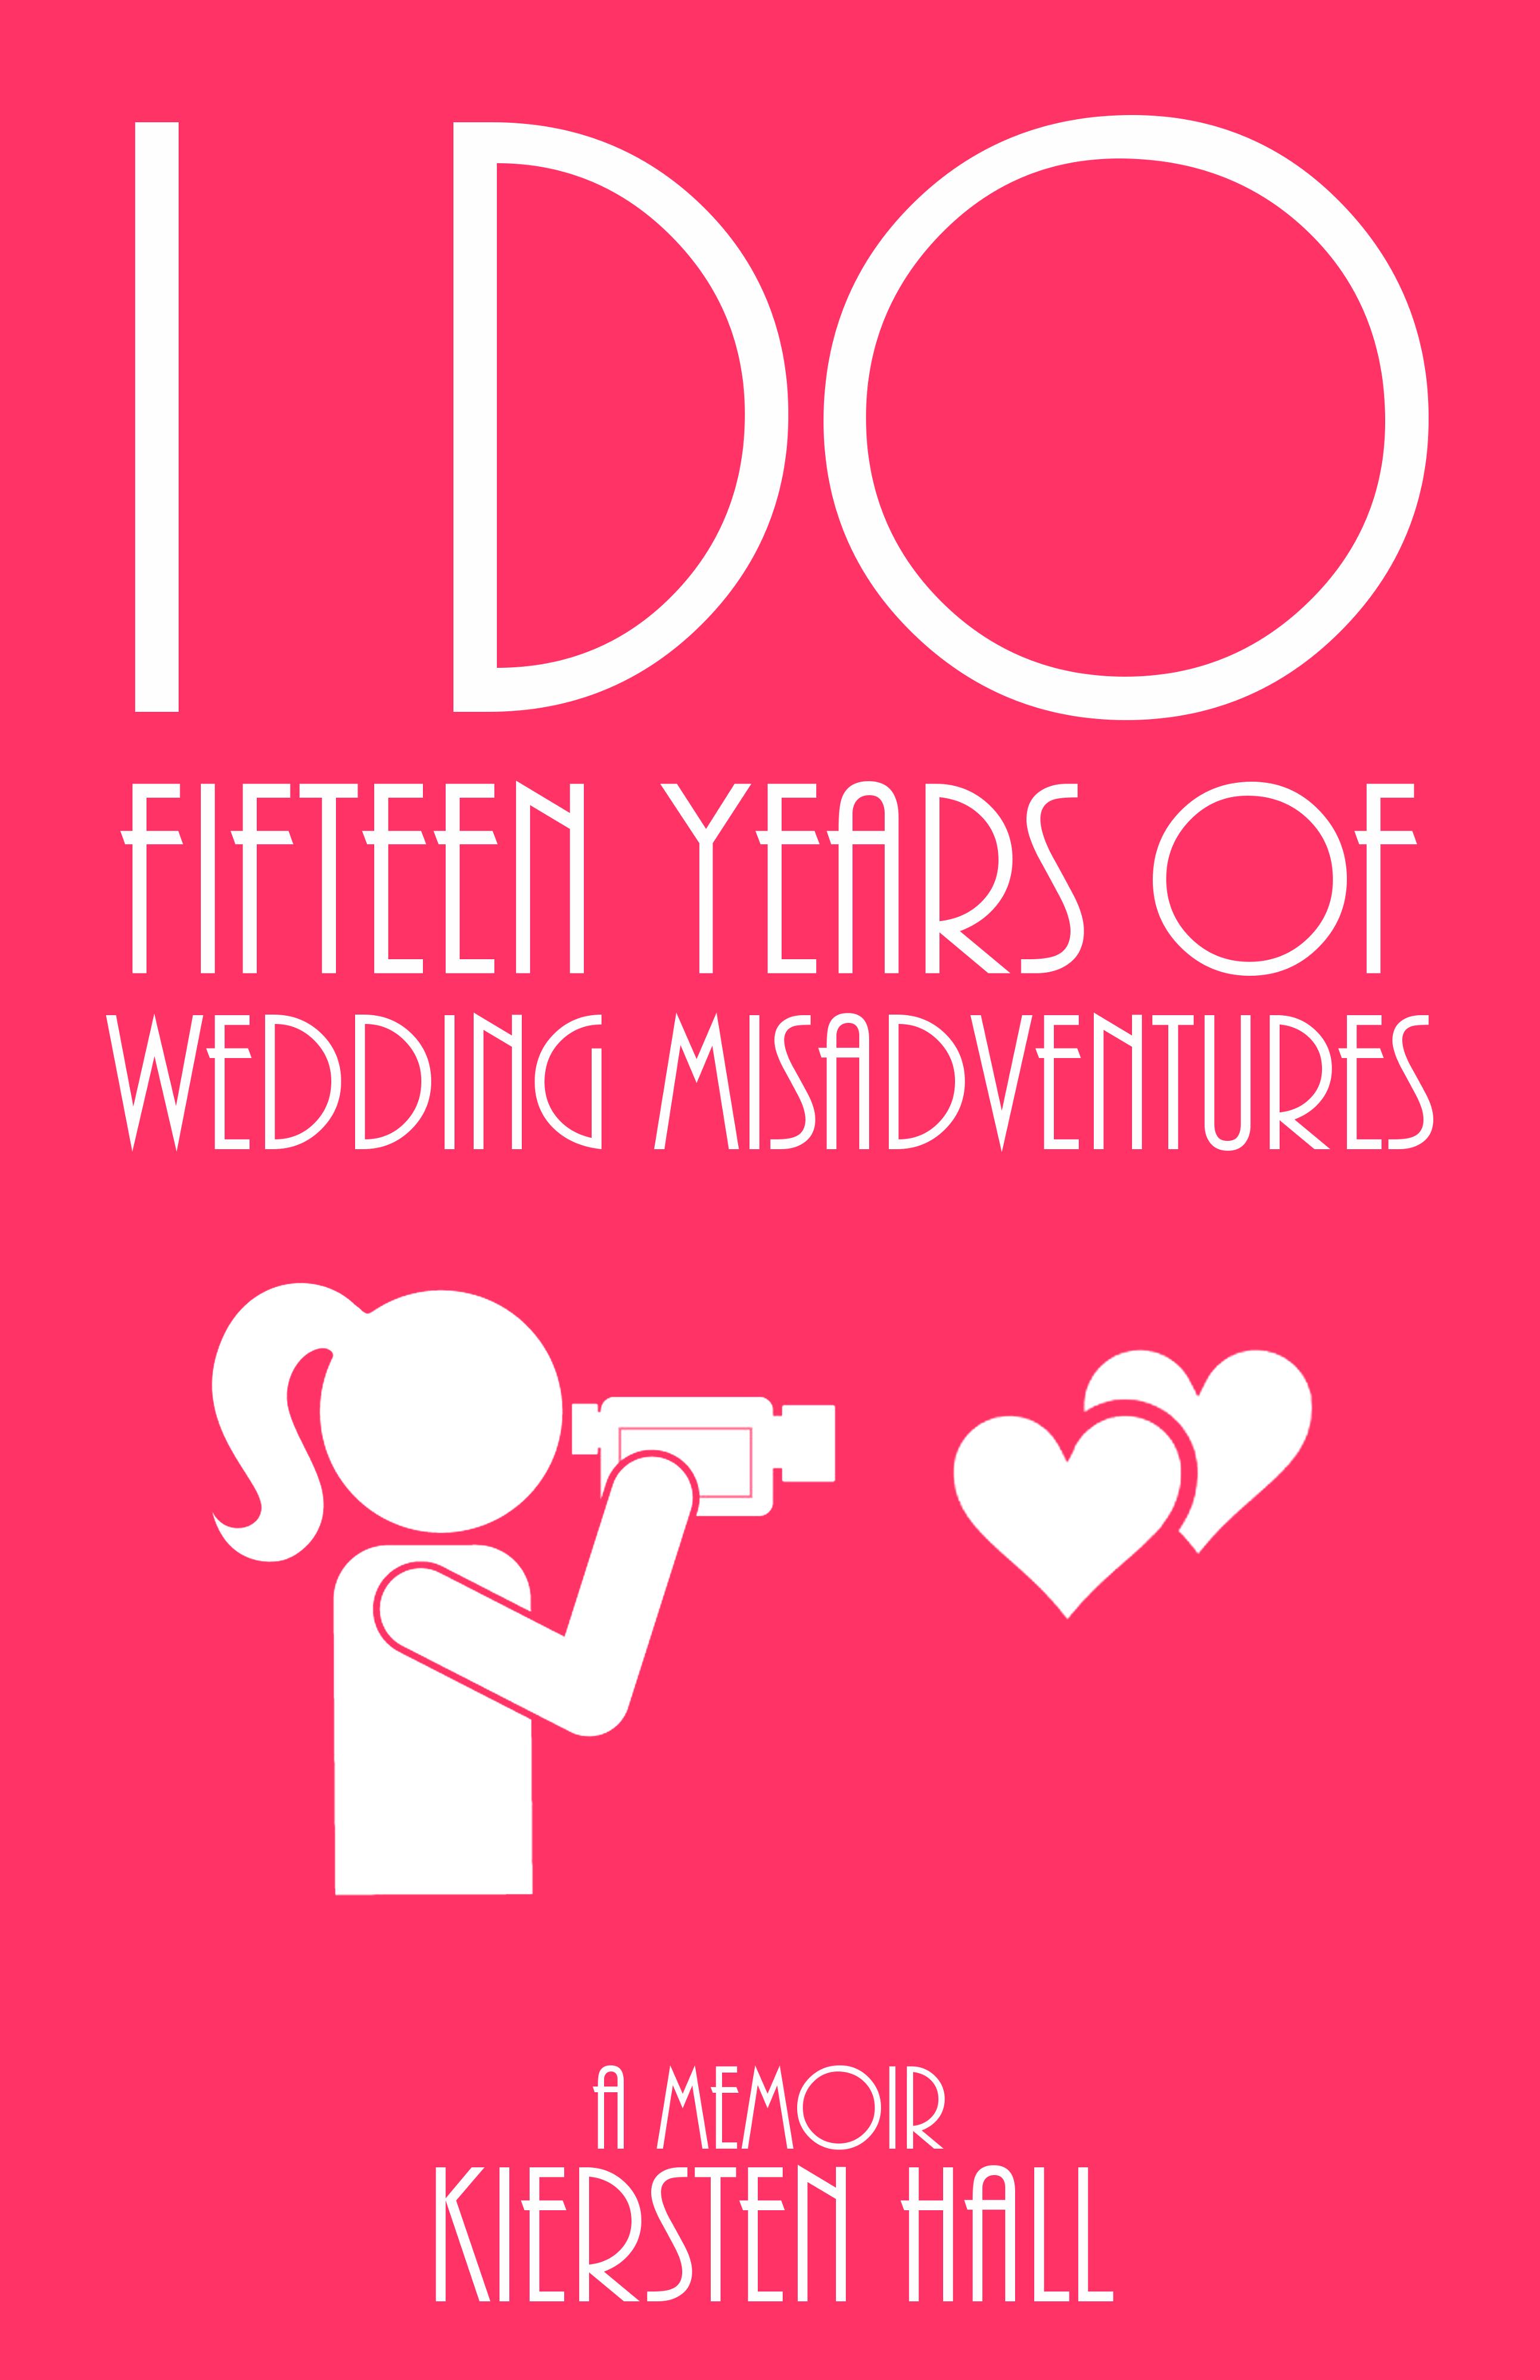 """I Do"" Fifteen Years of Wedding Misadventures"